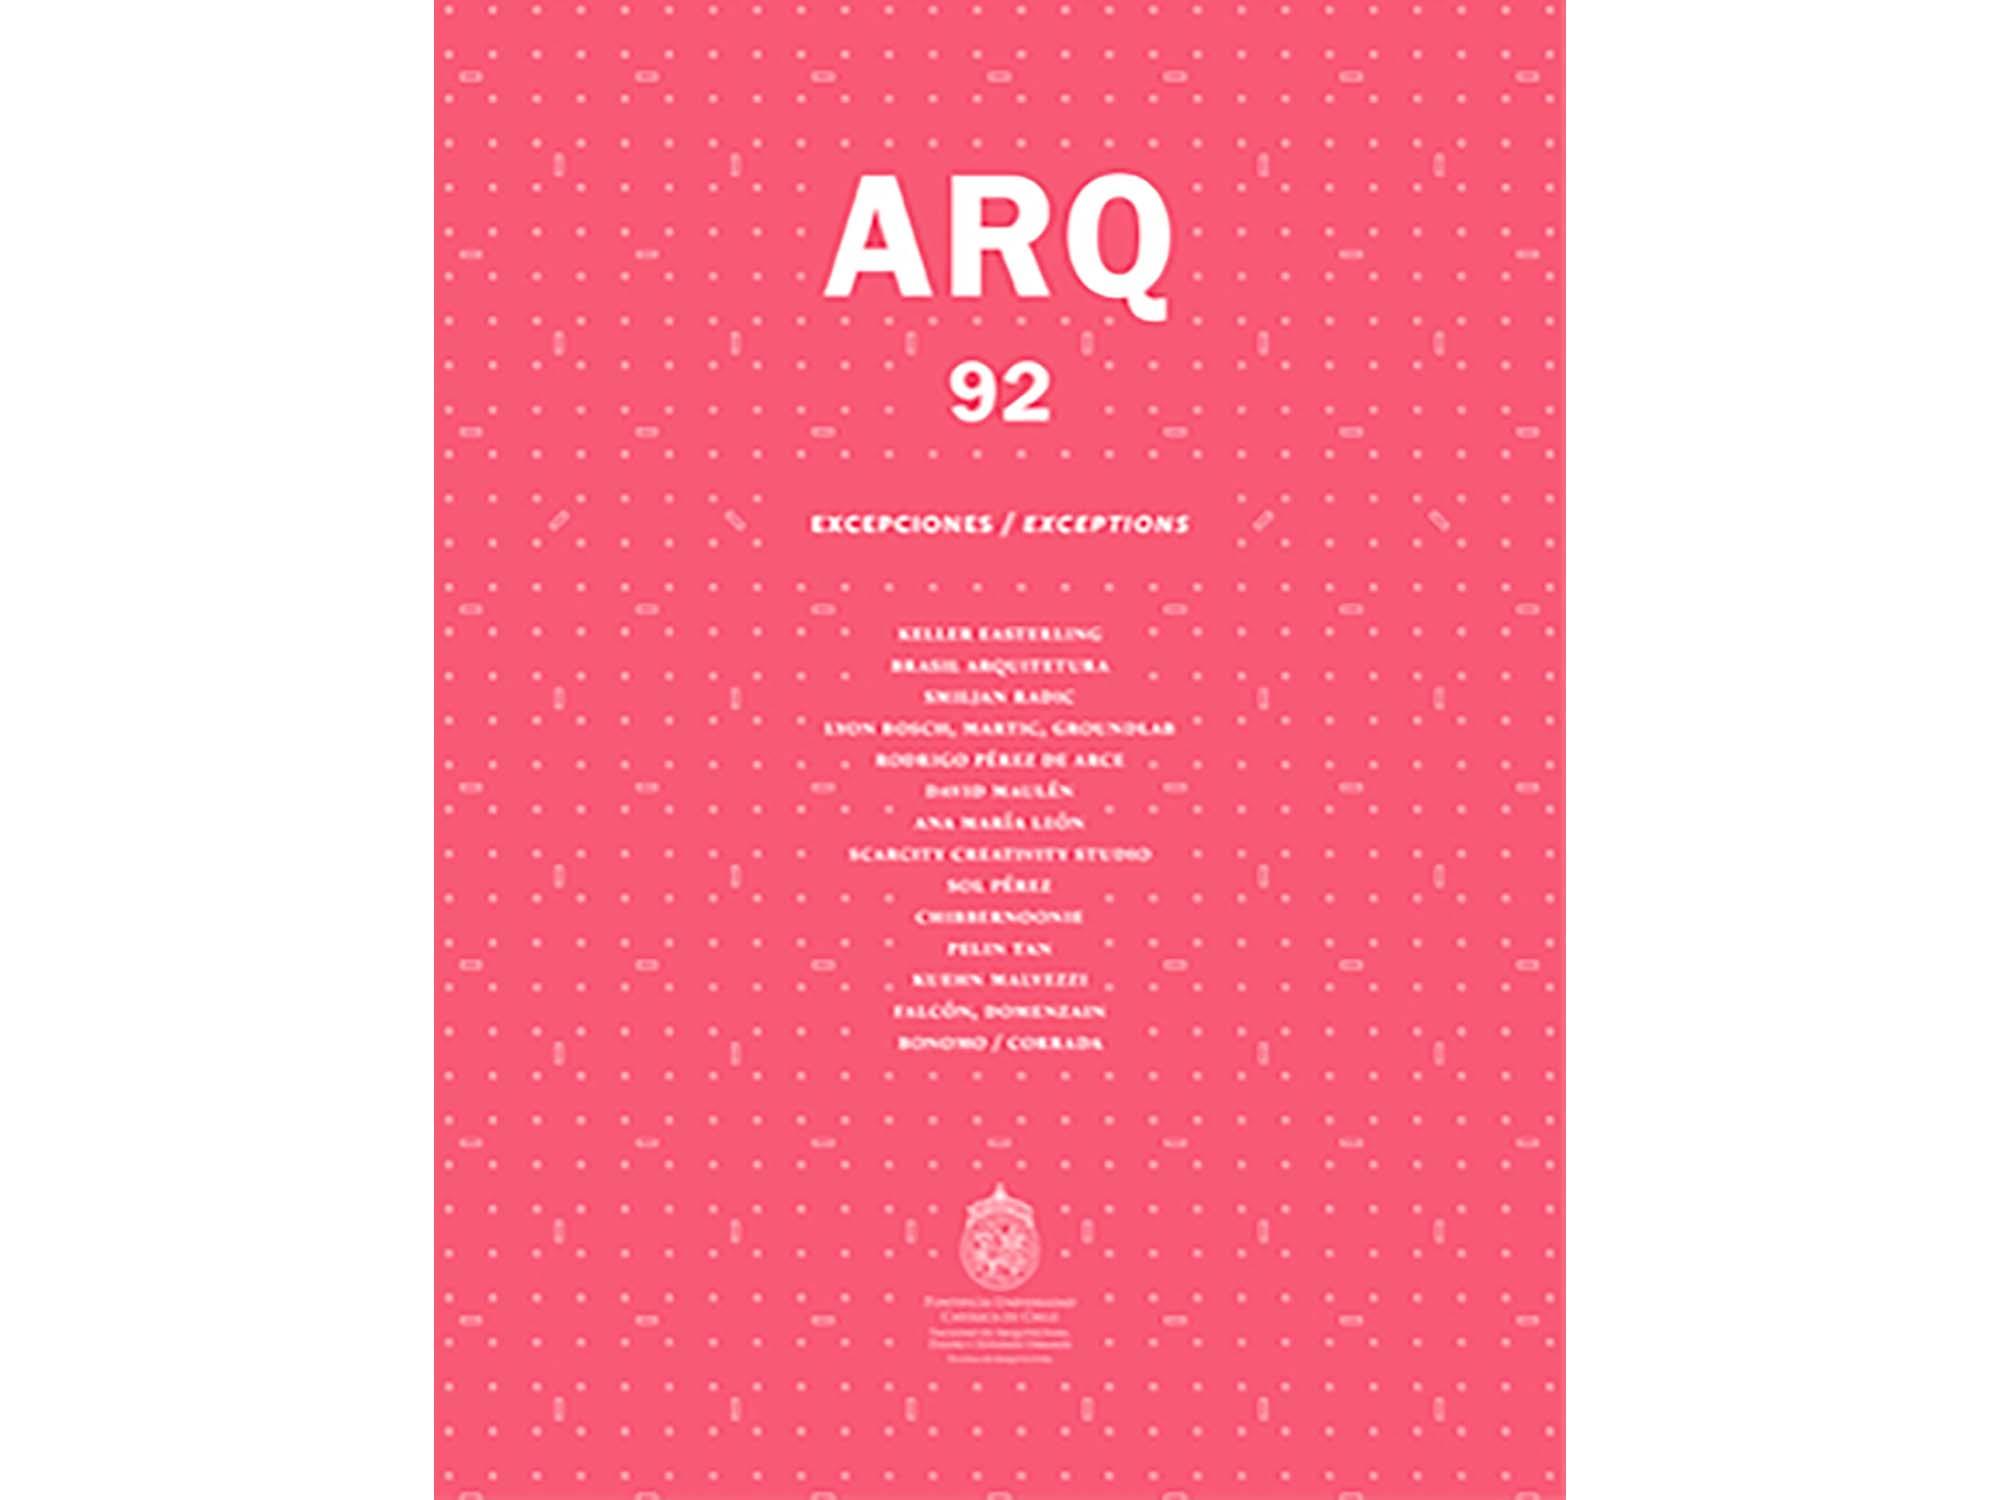 ARQ-92-01 copia.jpg